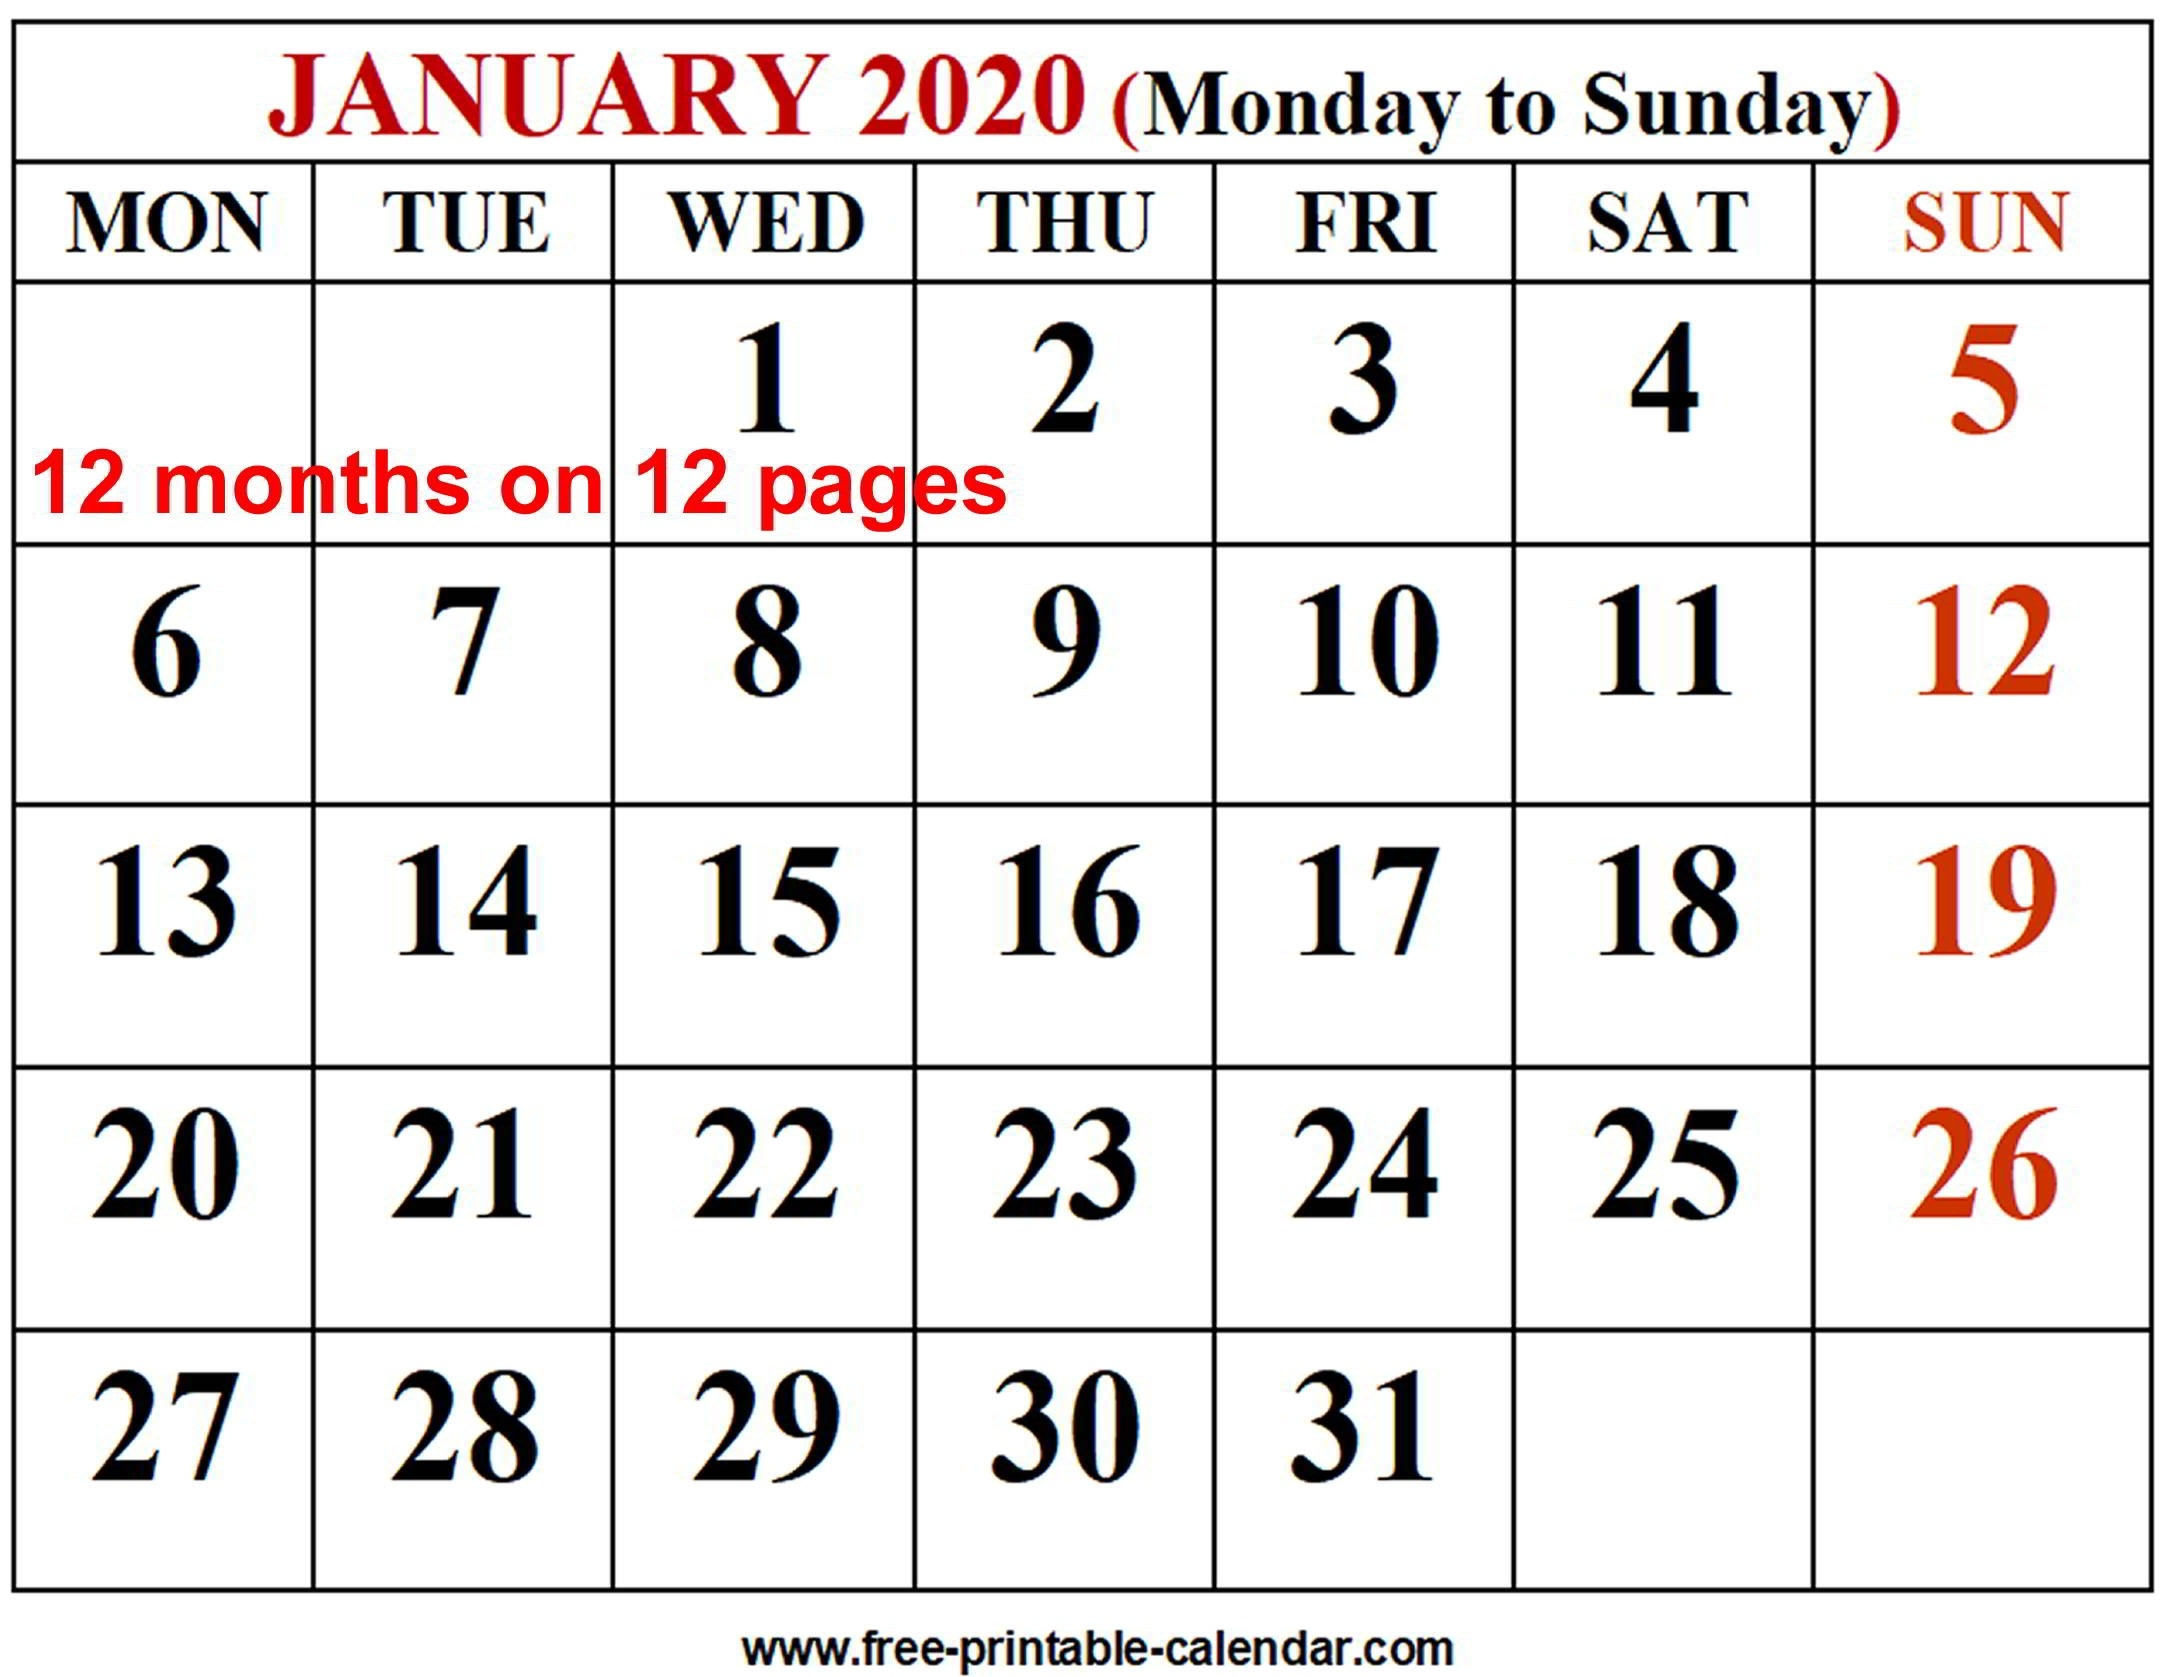 2020 Calendar Template - Free-Printable-Calendar-Printable Monthly Calendar Templates Uk